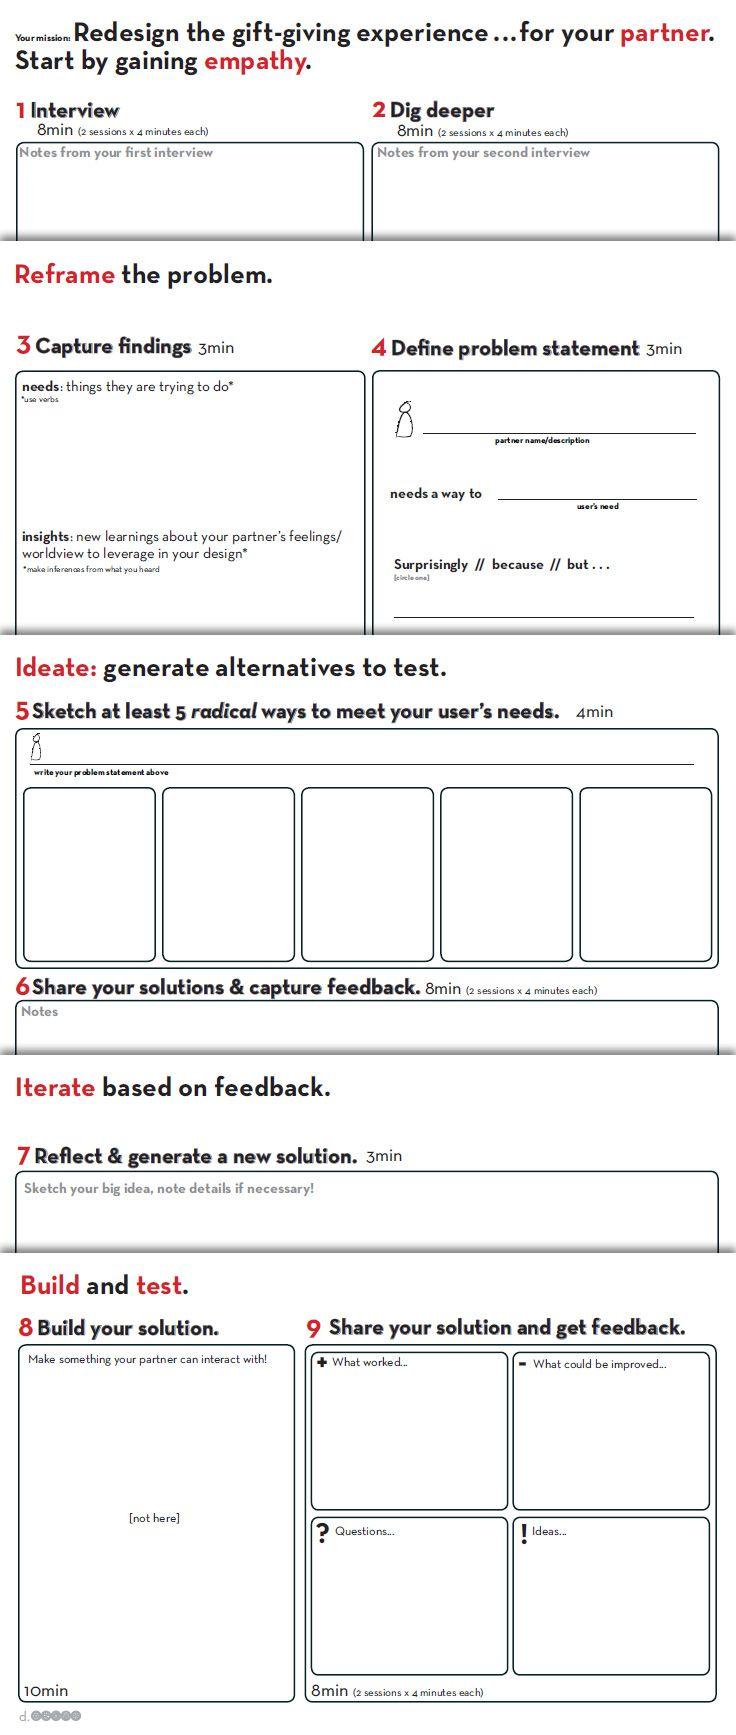 Worksheet Provided By D School Stanford Http Dschool Stanford Edu Dgift Design Thinking Process Design Thinking Tools Design Thinking,Designer Sweatpants Womens